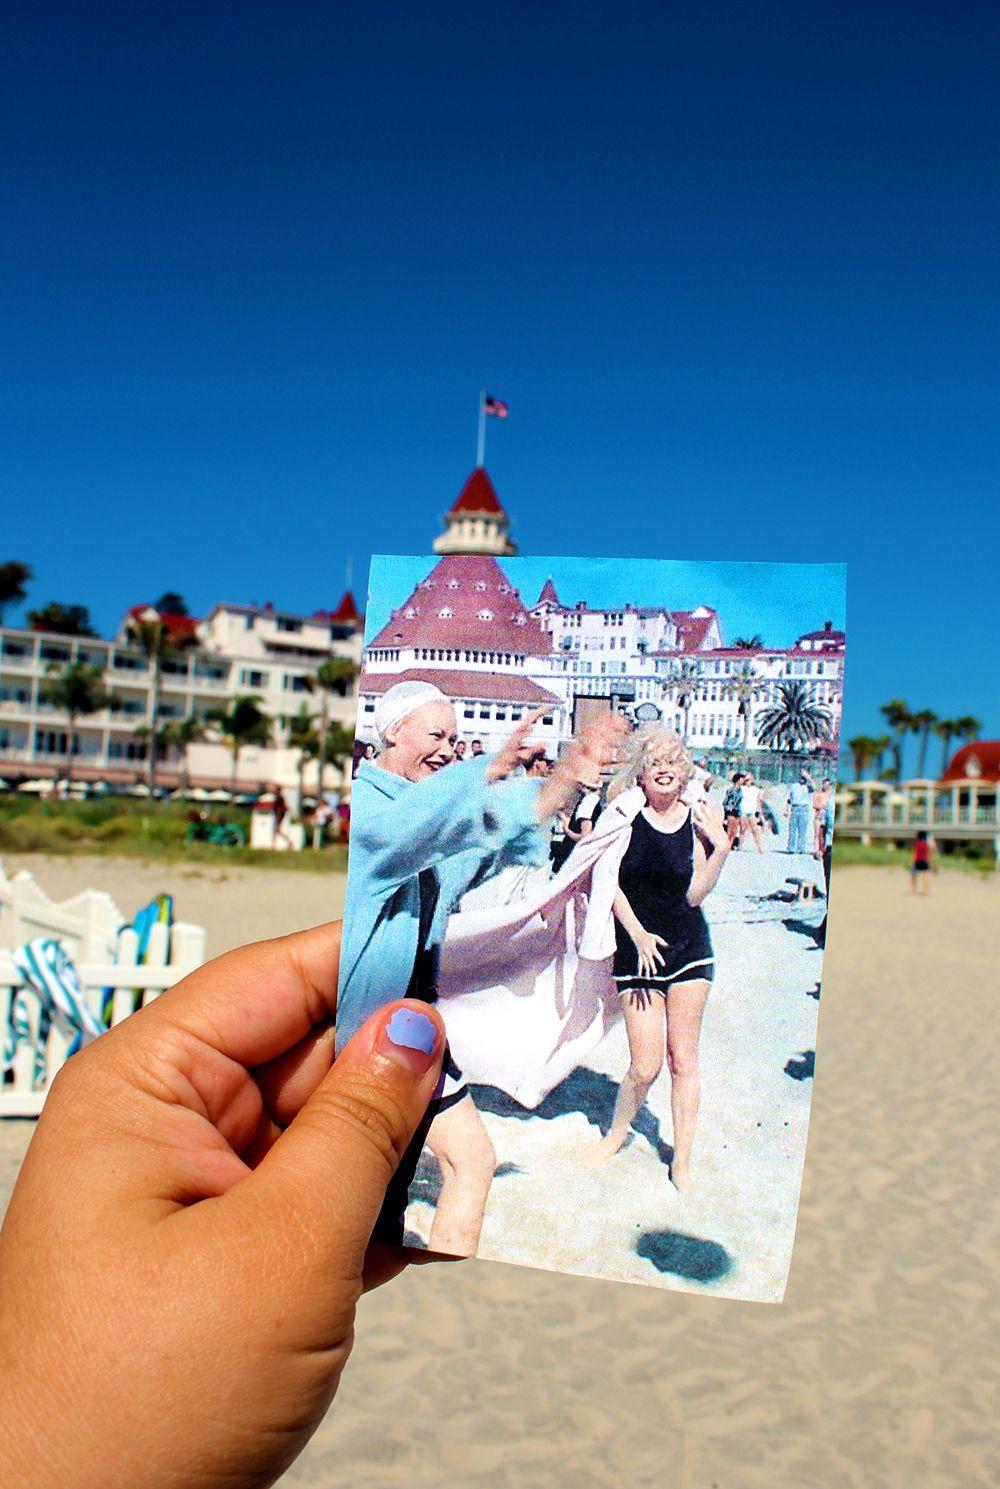 Coronado Beach San Go California Where Marilyn Monroe Filmed Some Like It Hot In 1959 I Have To Here S Cali